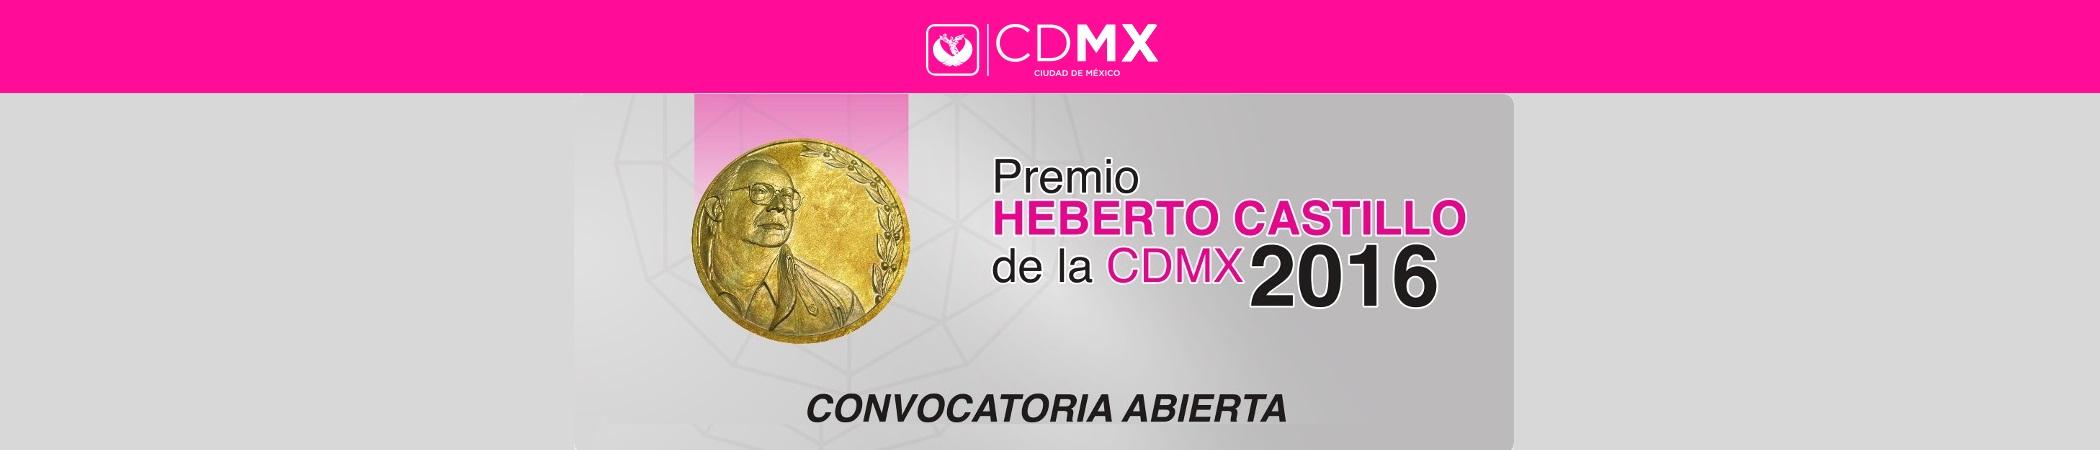 Premio Heberto Castillo